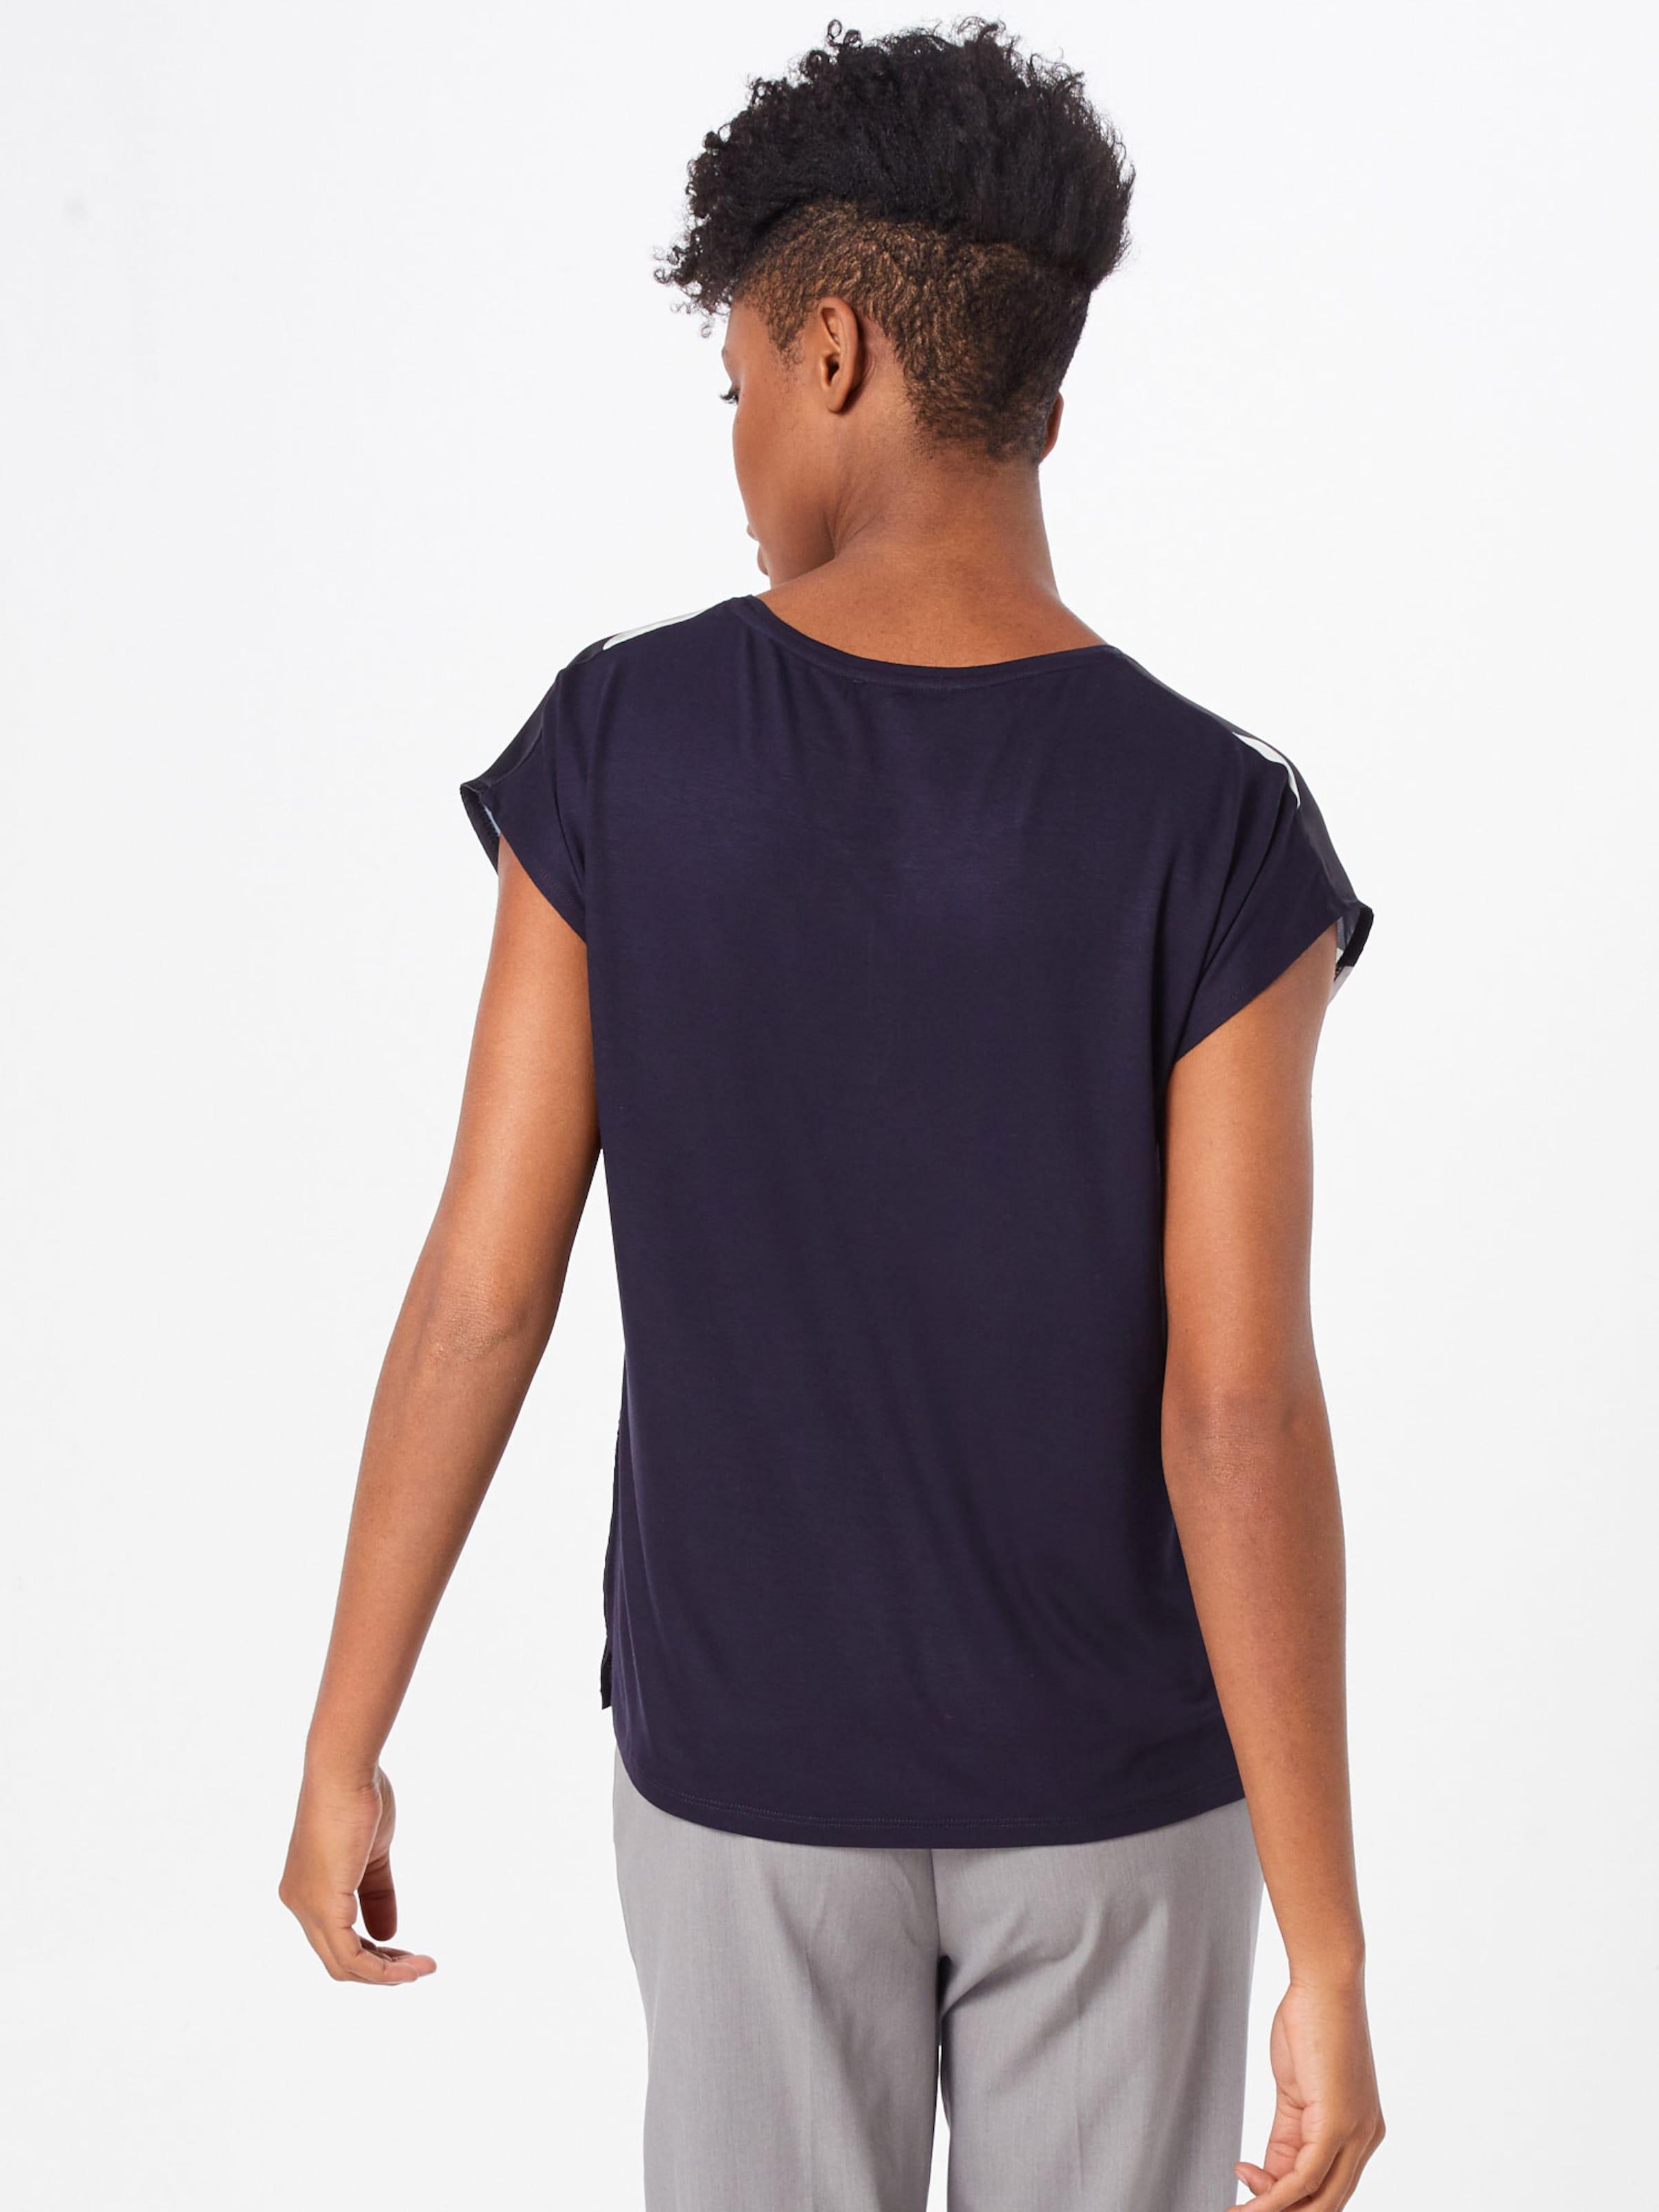 En MarineBlanc shirt T Moreamp; shirt Moreamp; T En LVMpGUzqS